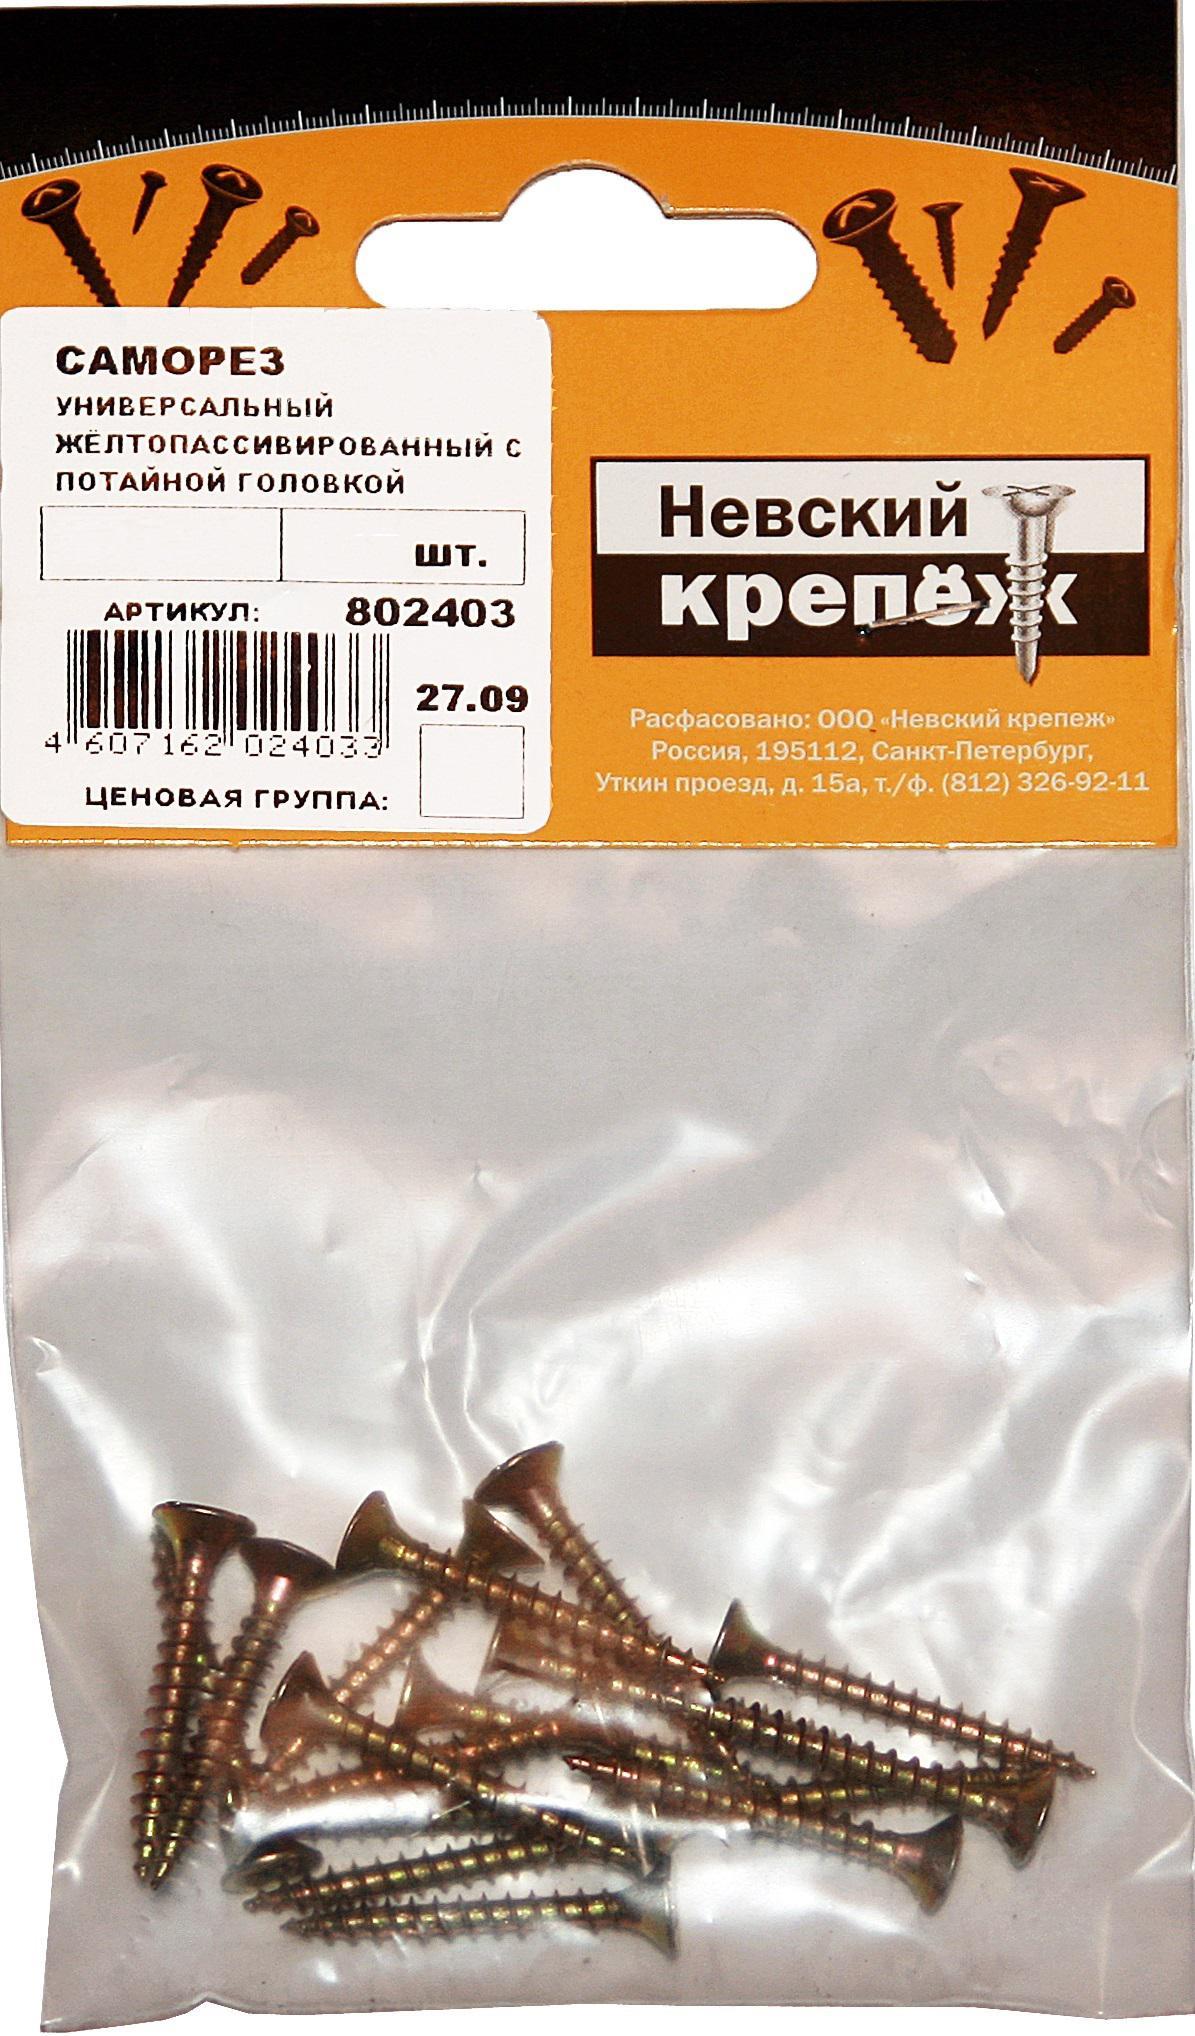 Саморез НЕВСКИЙ КРЕПЕЖ 802395